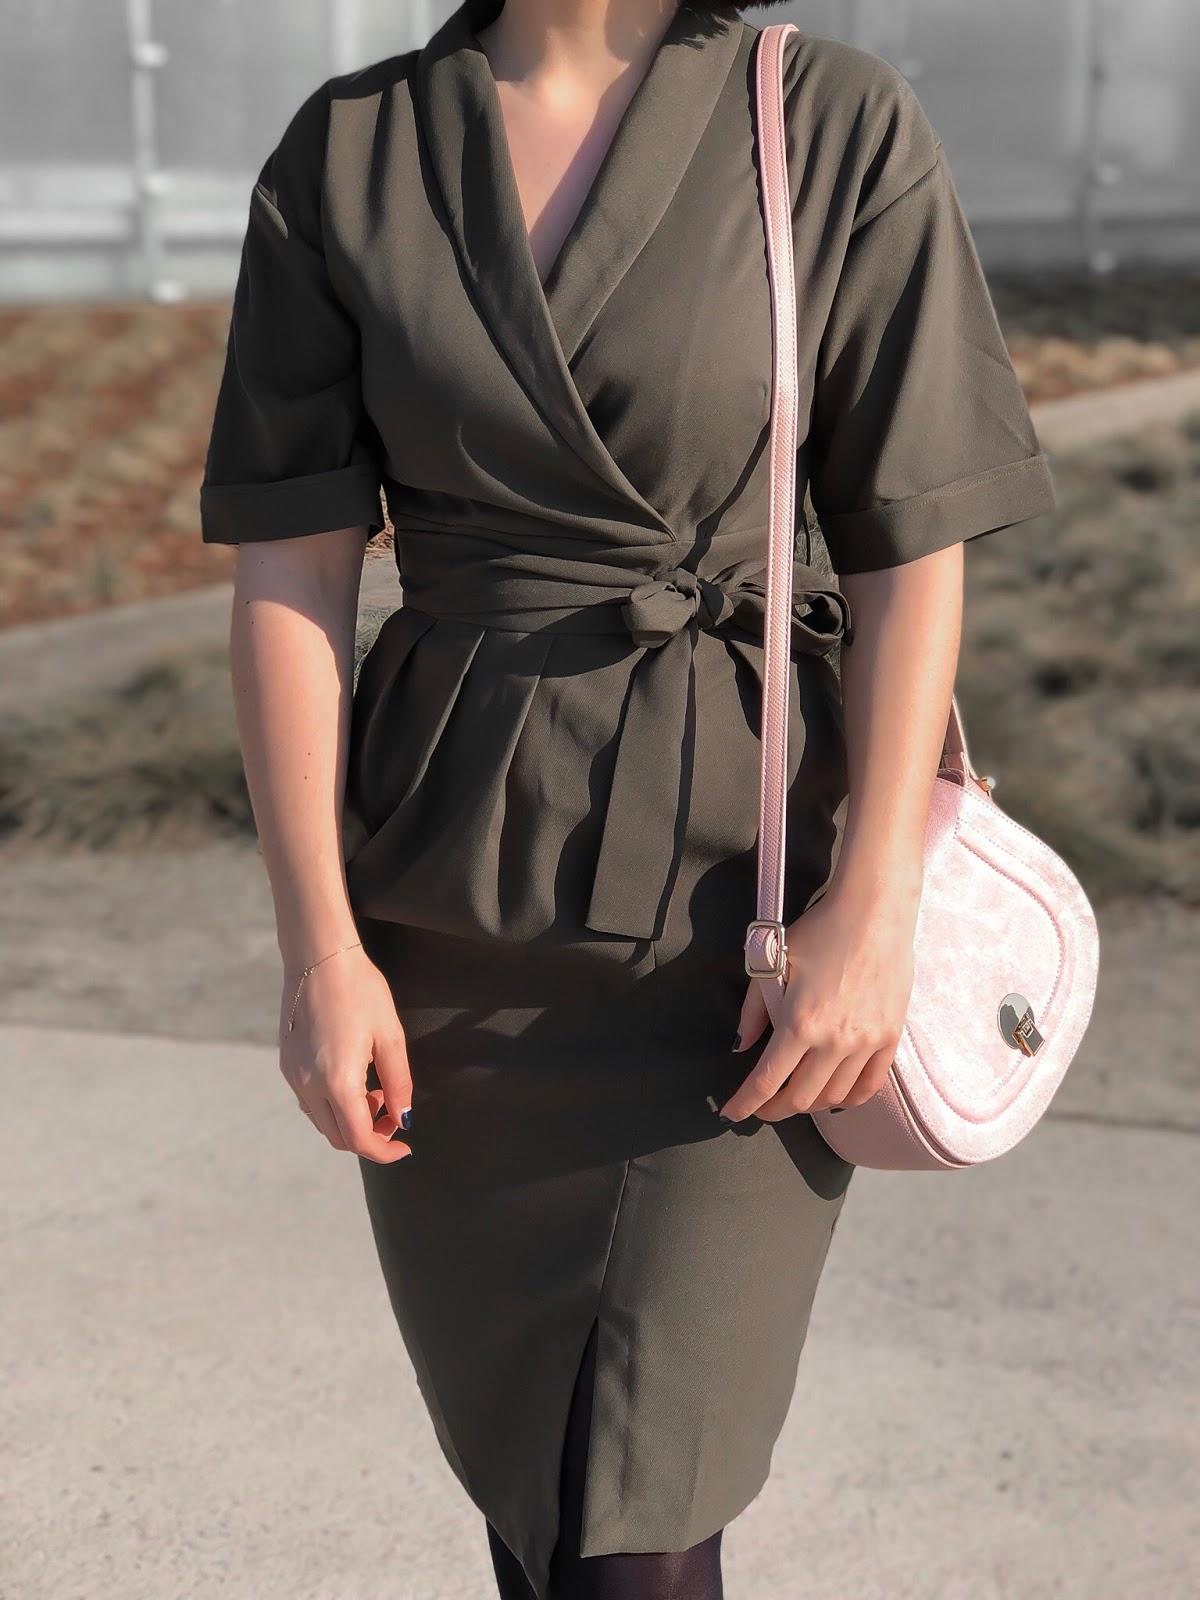 oliwkowa sukienka, sukienka khaki, khaki, kopertowa sukienka, elegancki look, czarna ramoneska